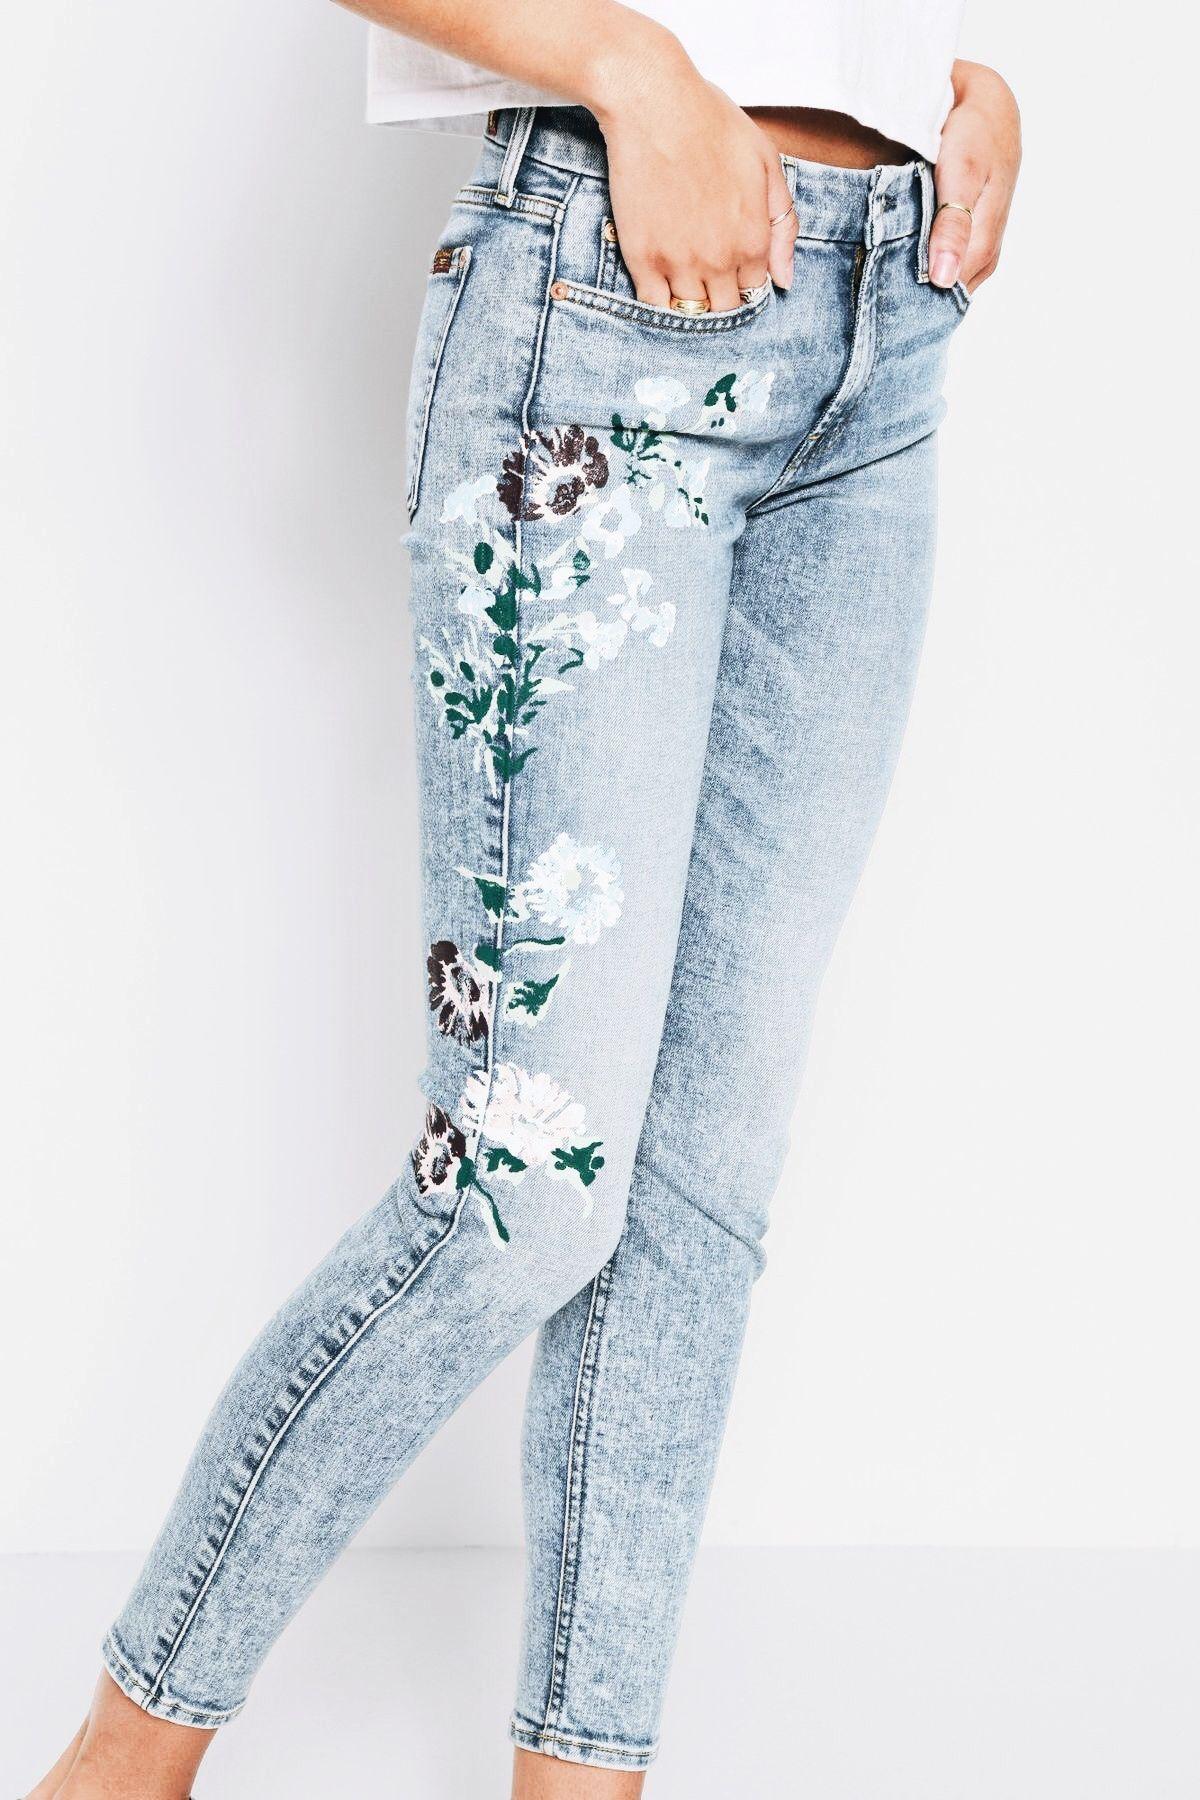 P I N T E R E S T: Maggie875 | Fashion, Embroidered jeans